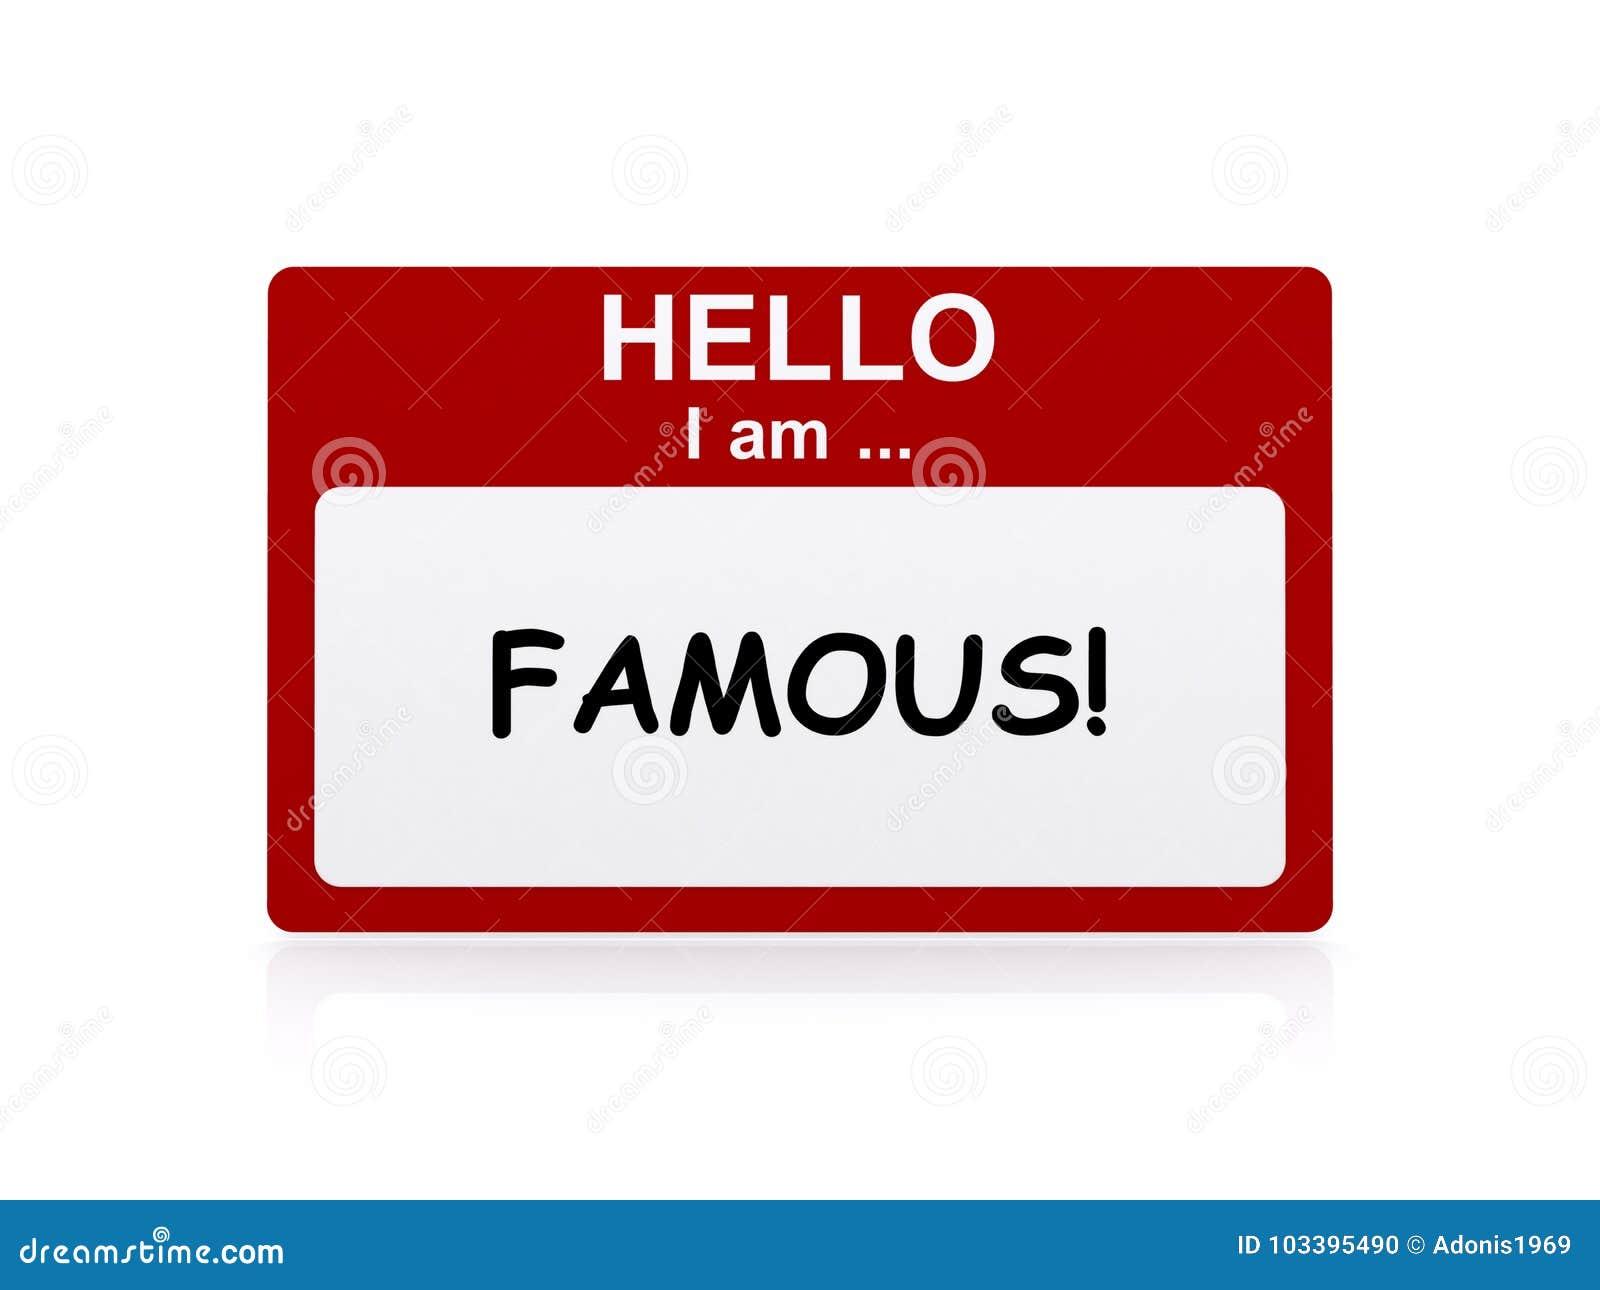 Hola soy famoso